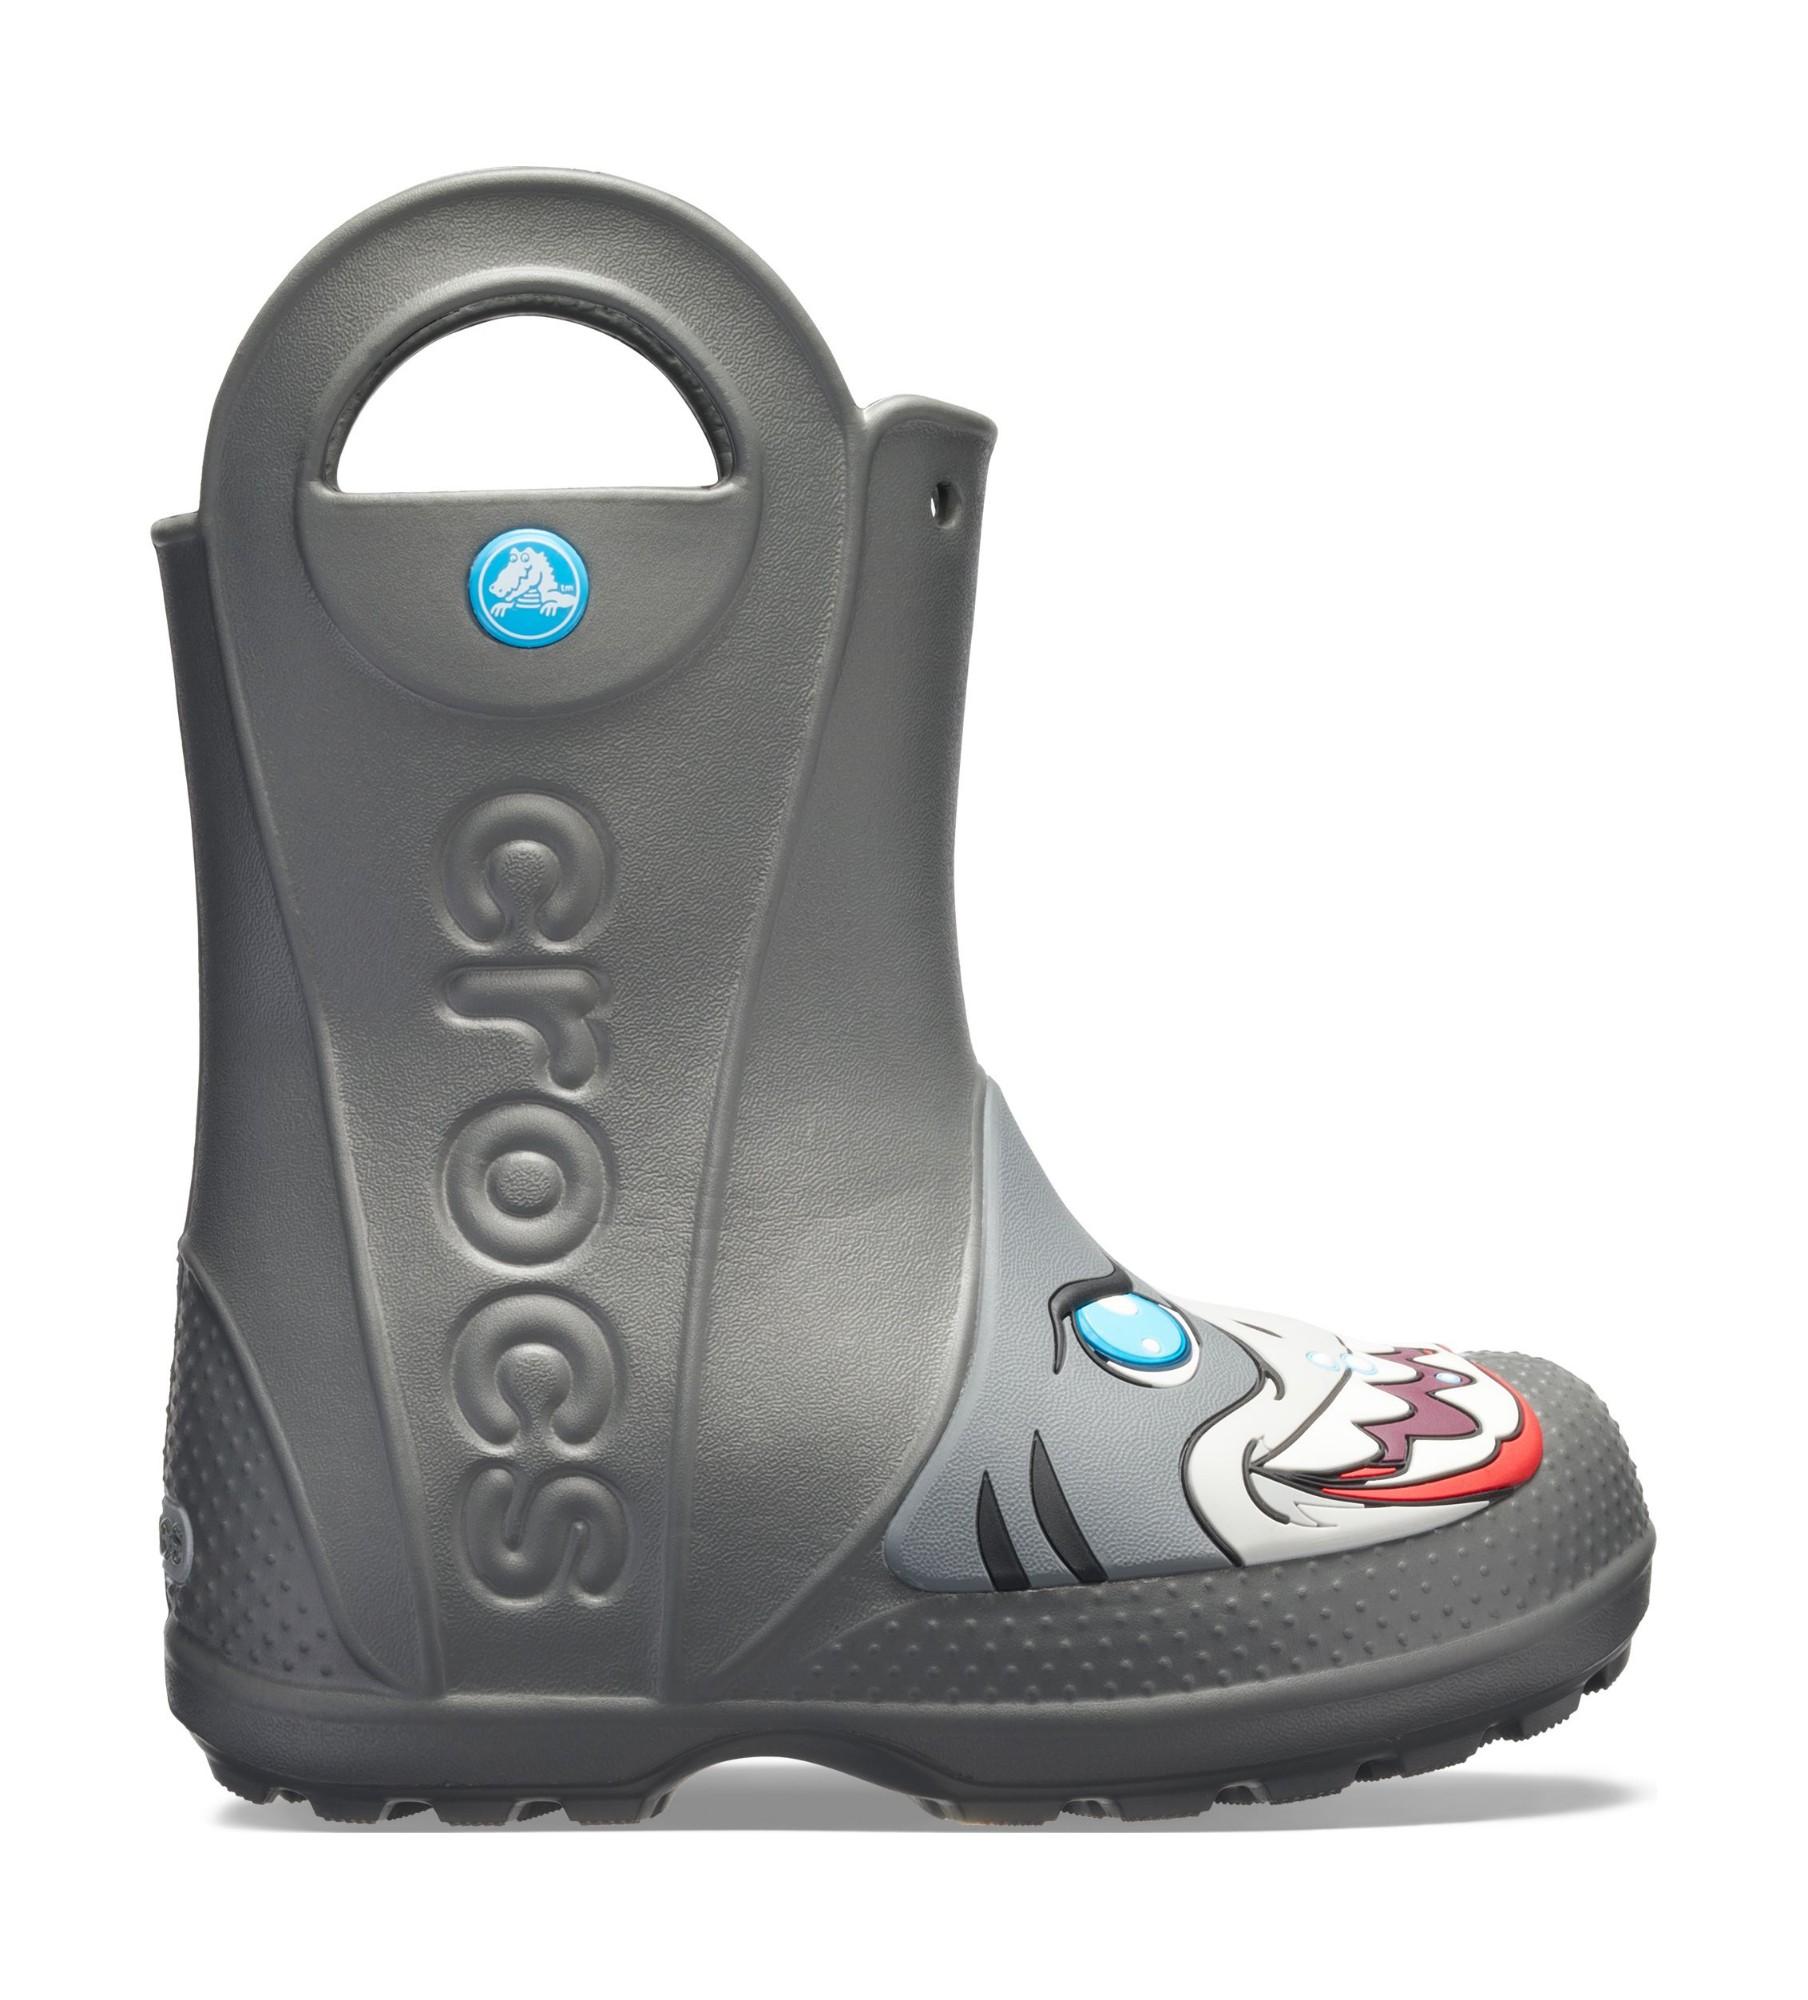 8da8dc59f Crocs™ Kids  Crocs Funlab Creature Rain Boot